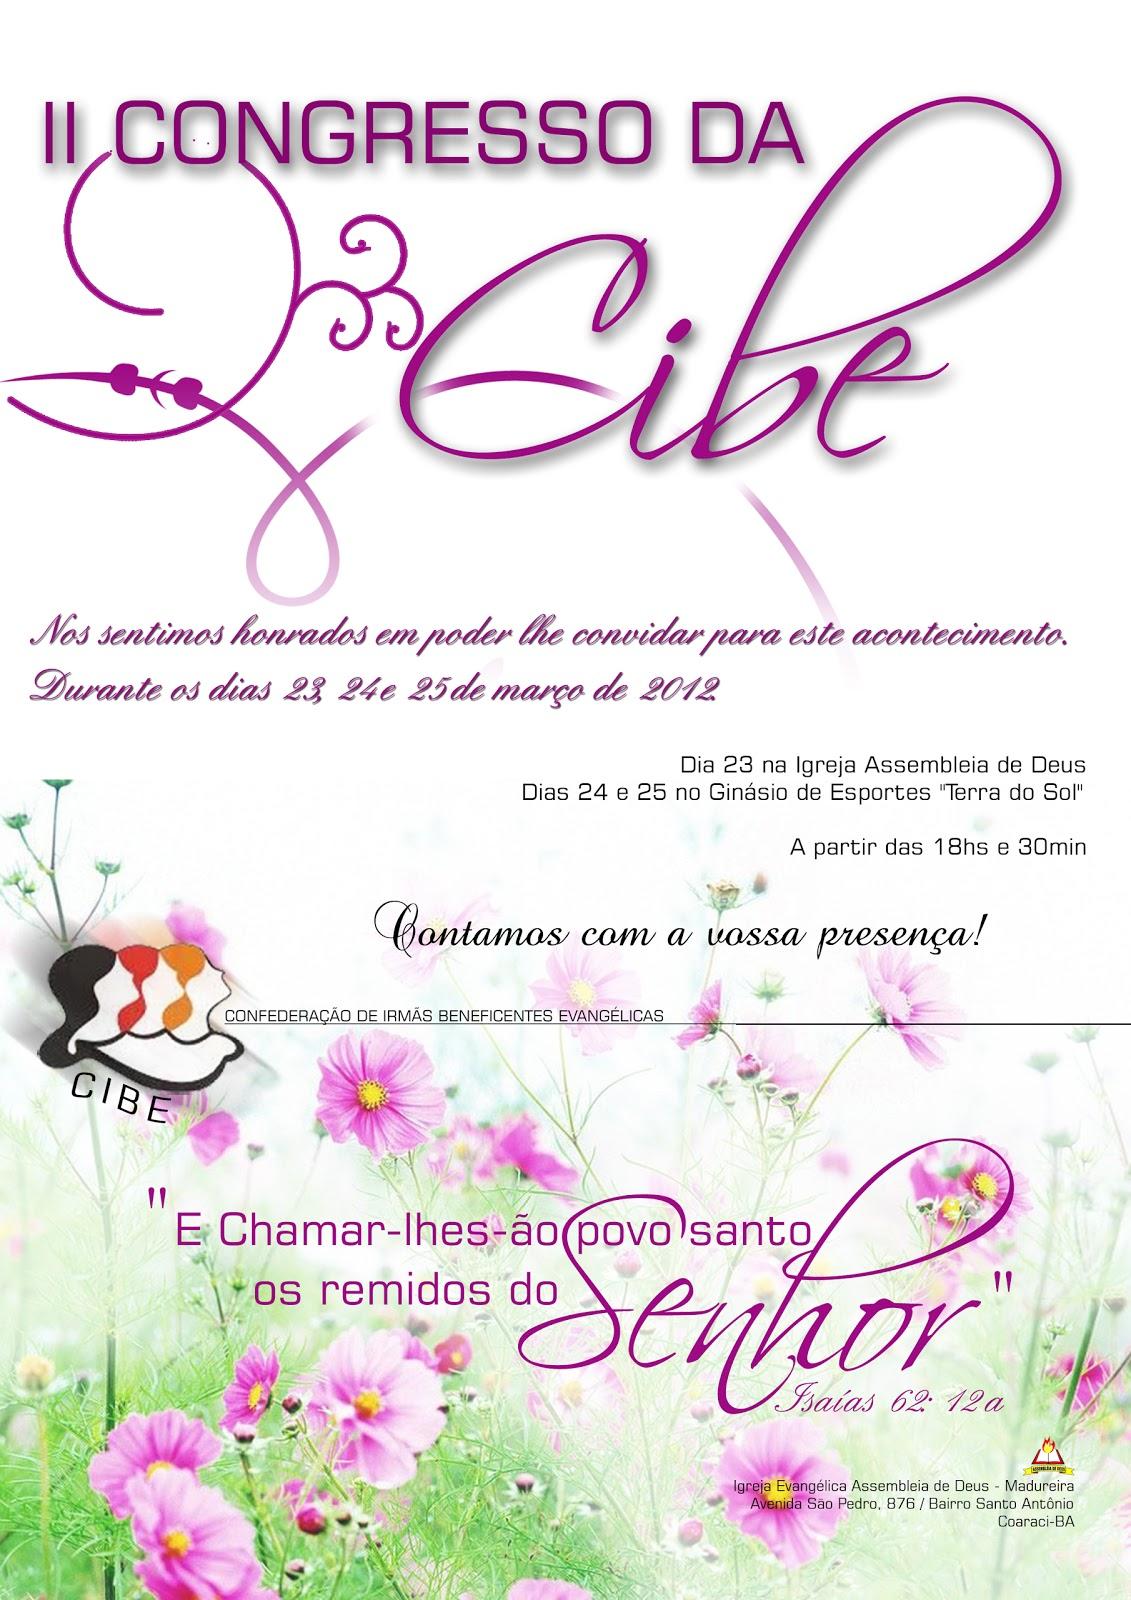 Madureira em Coaraci: II Congresso da CIBE - CONVITE